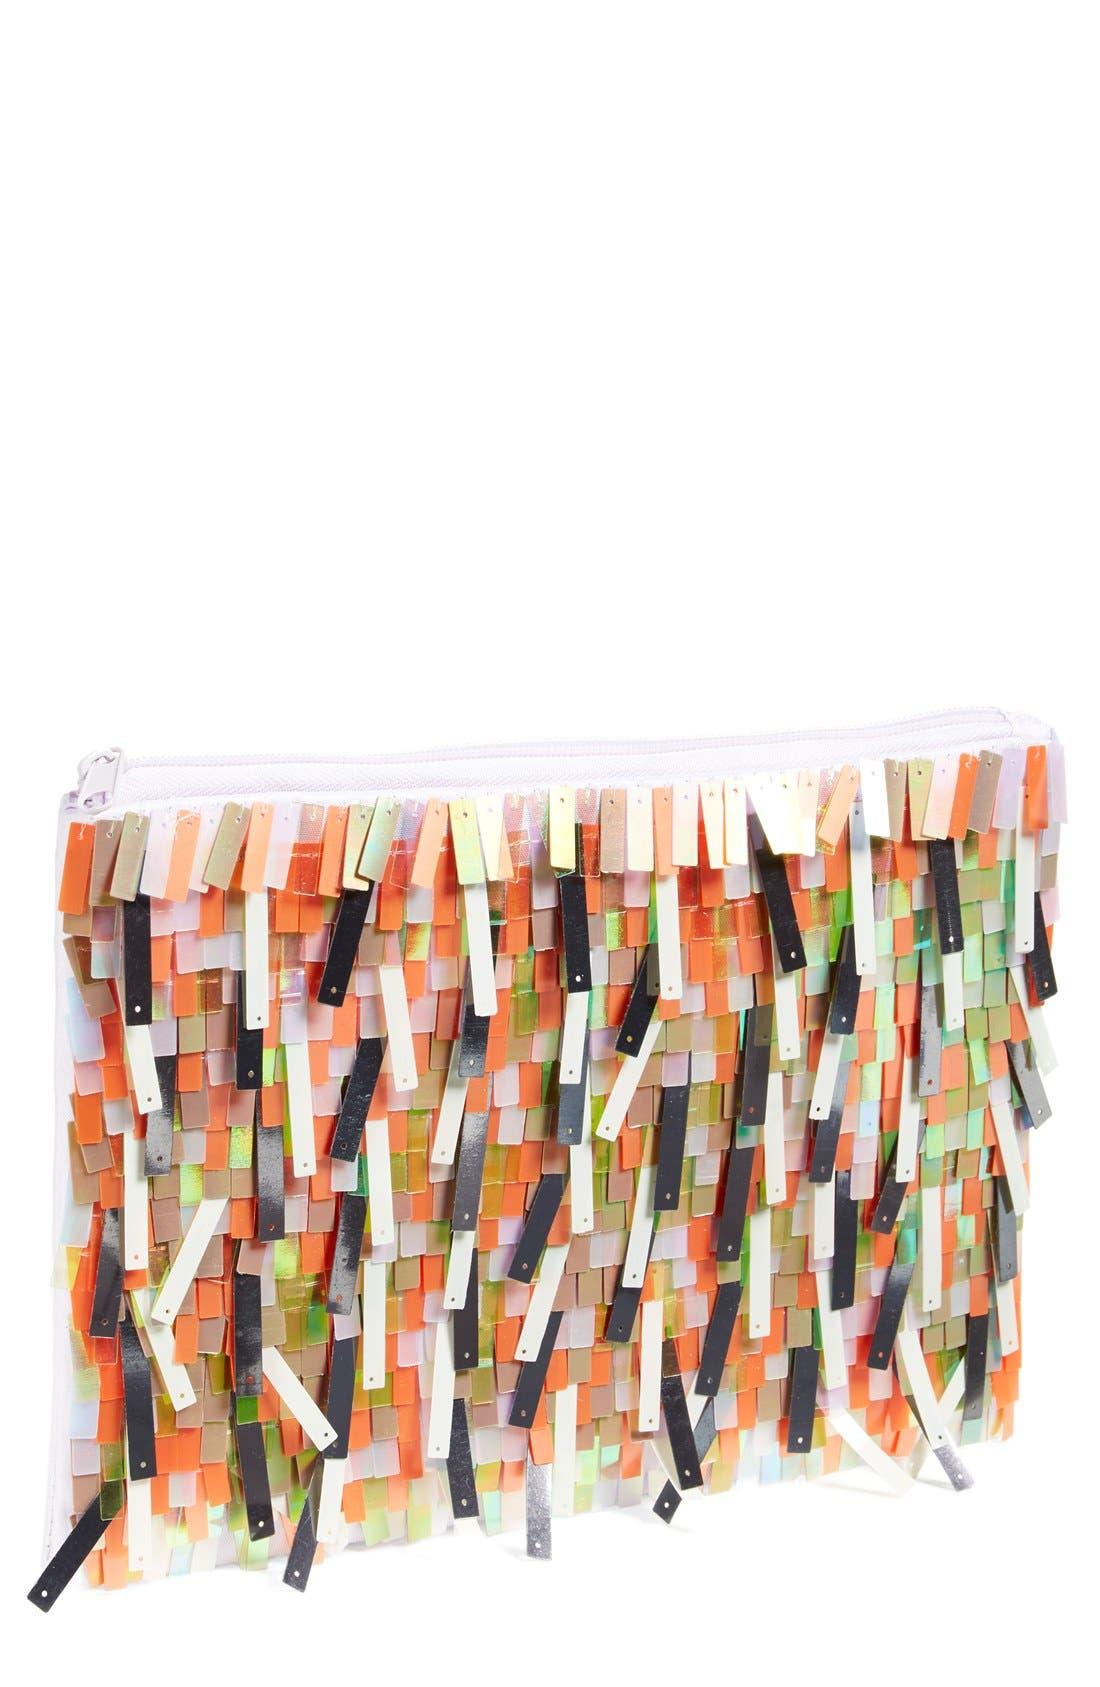 BERRY Sequin Fringe Clutch, Main, color, 040